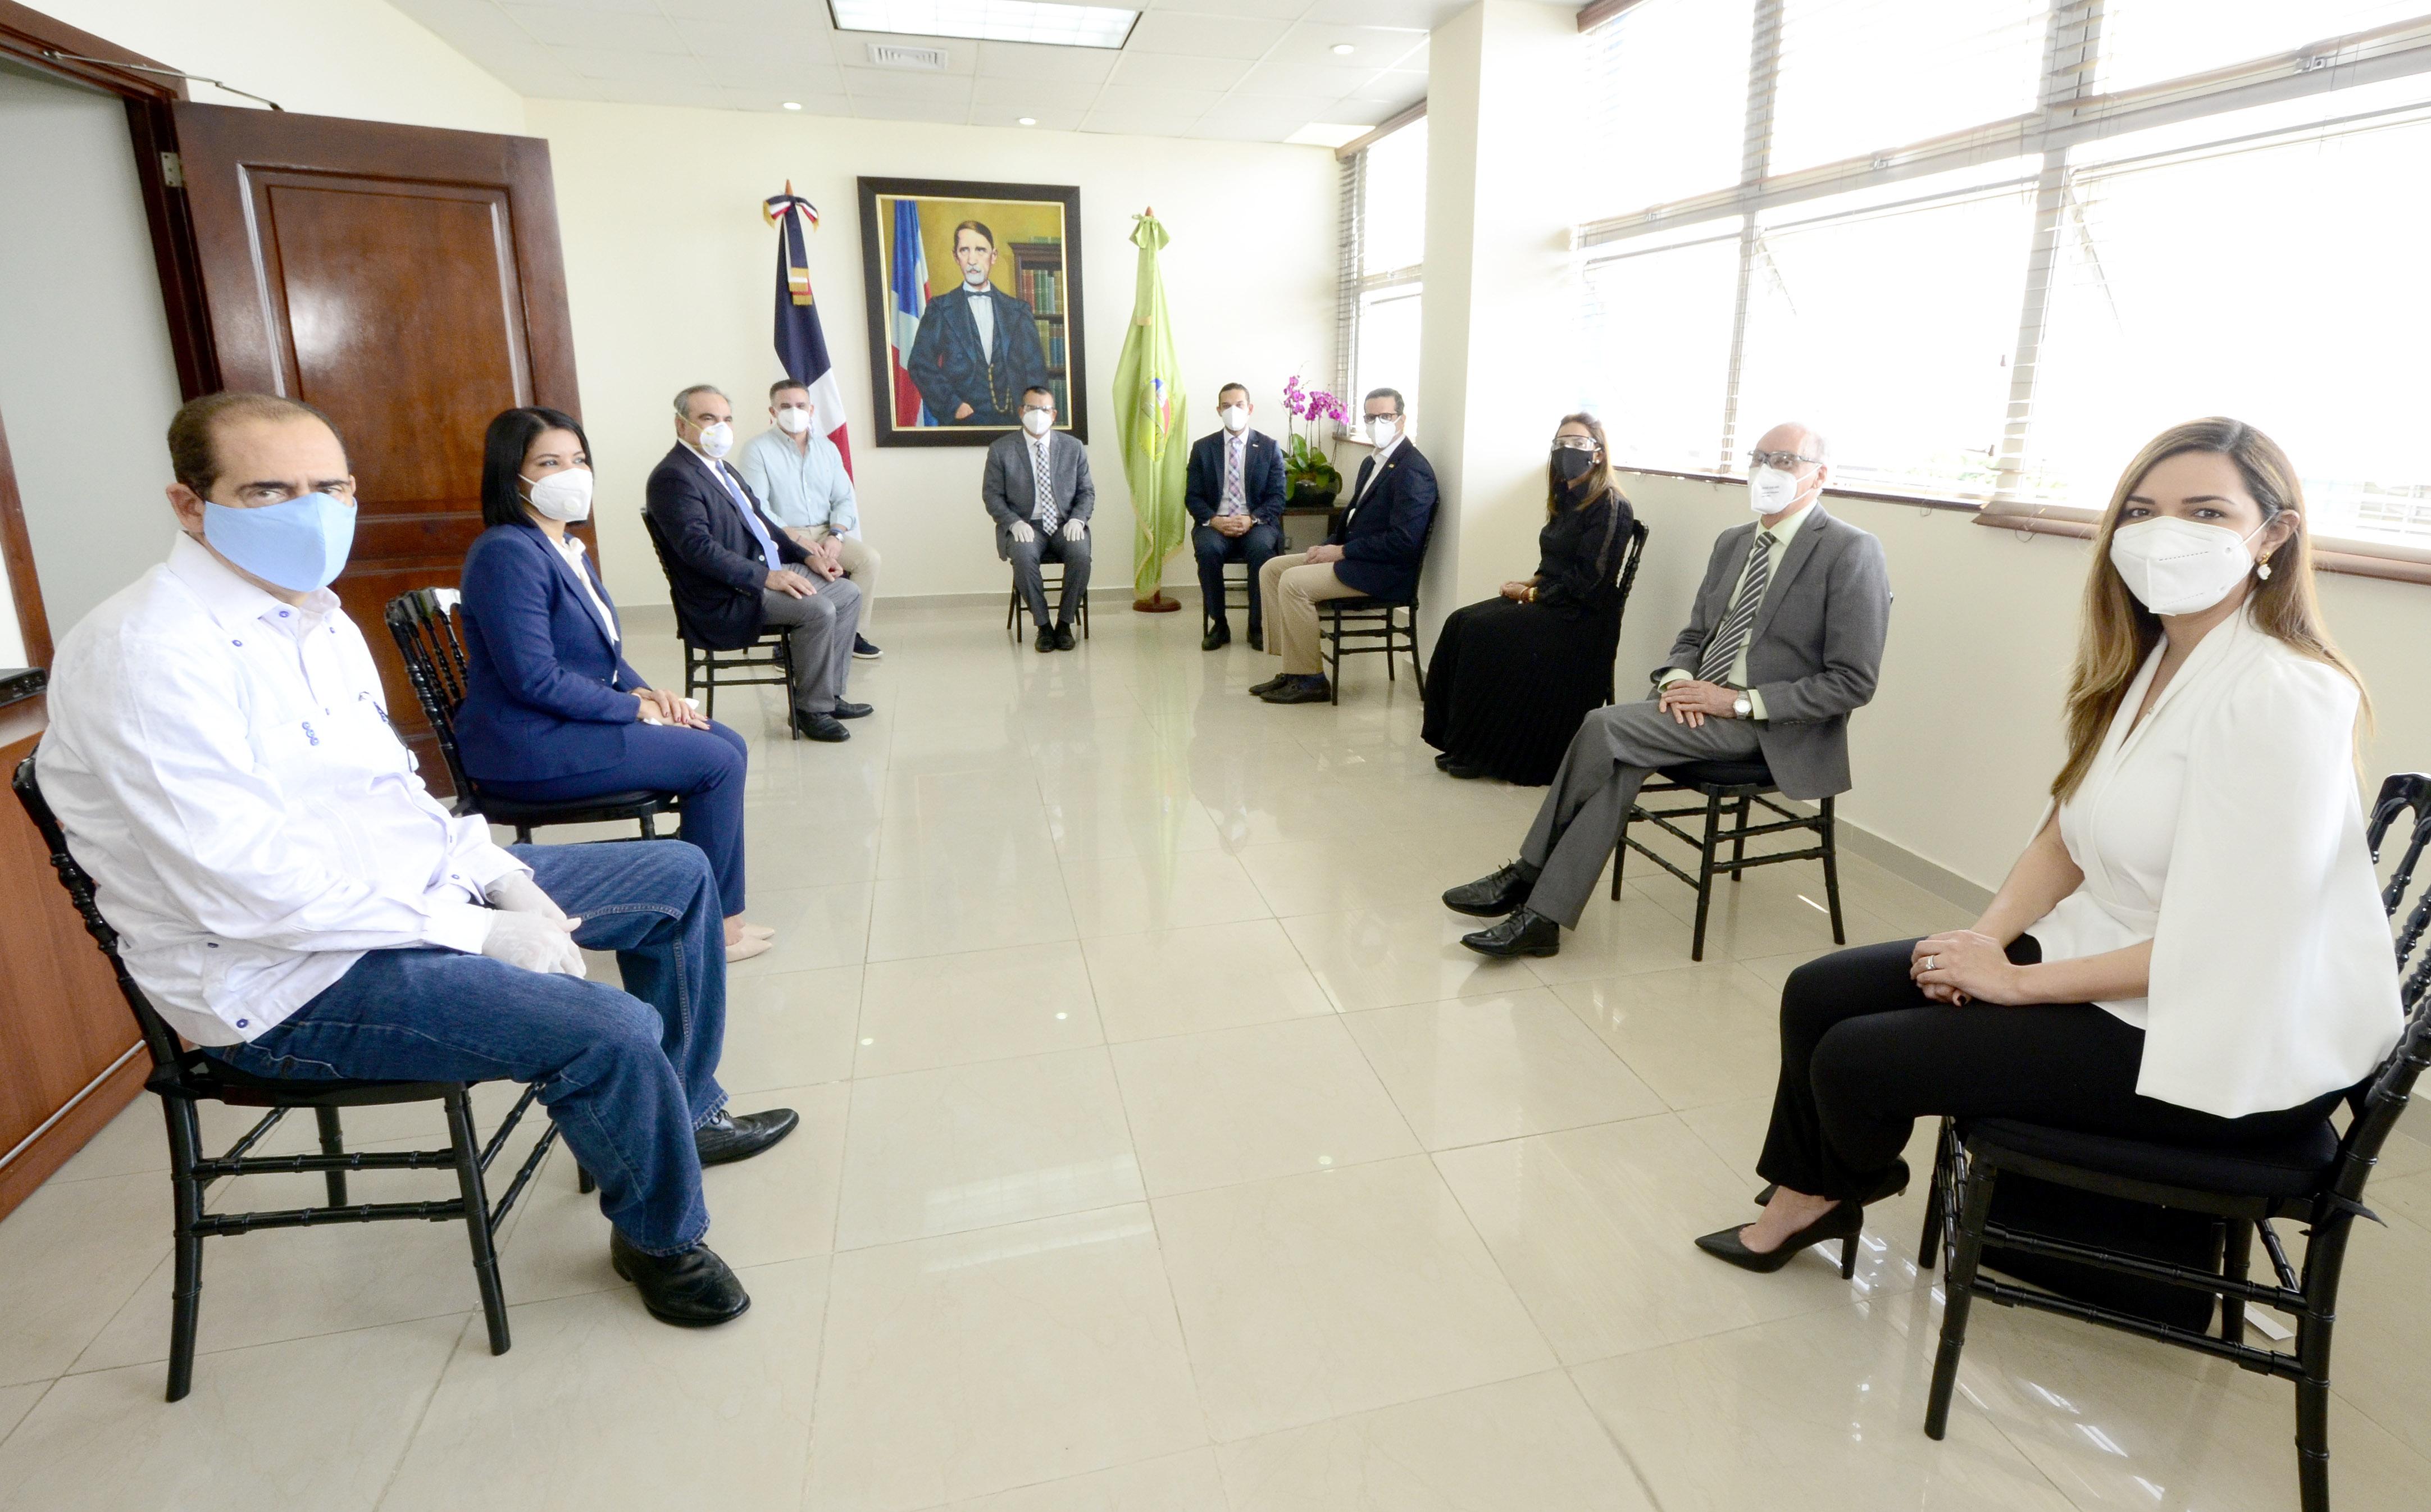 Pleno del TSE recibe a representantes del Conep, Anje y AIRD previo a comicios